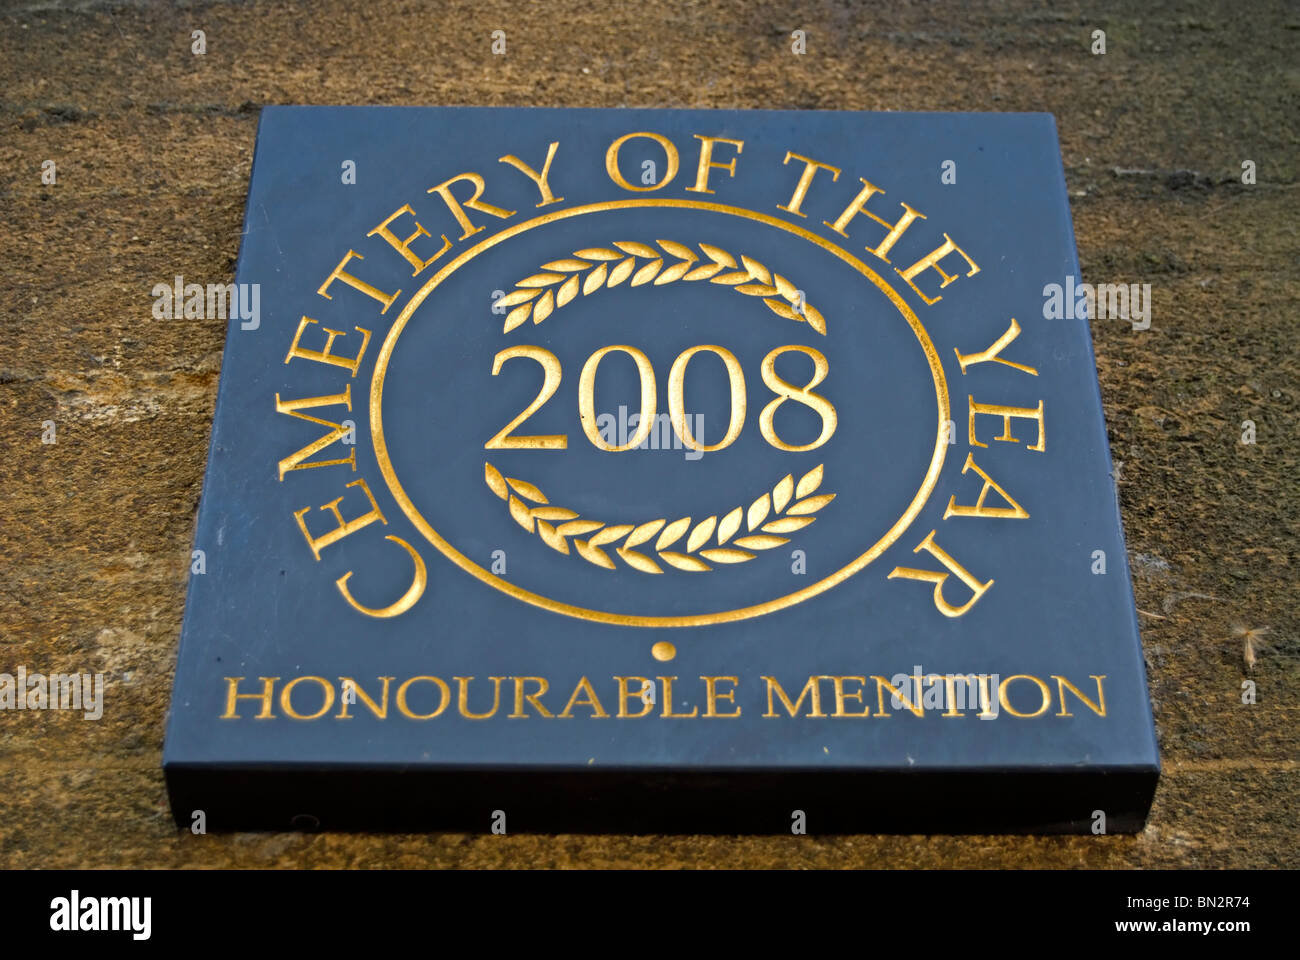 Cementerio del año 2008 Accésit placa en East sheen cementerio, East Sheen, Surrey, Inglaterra Imagen De Stock